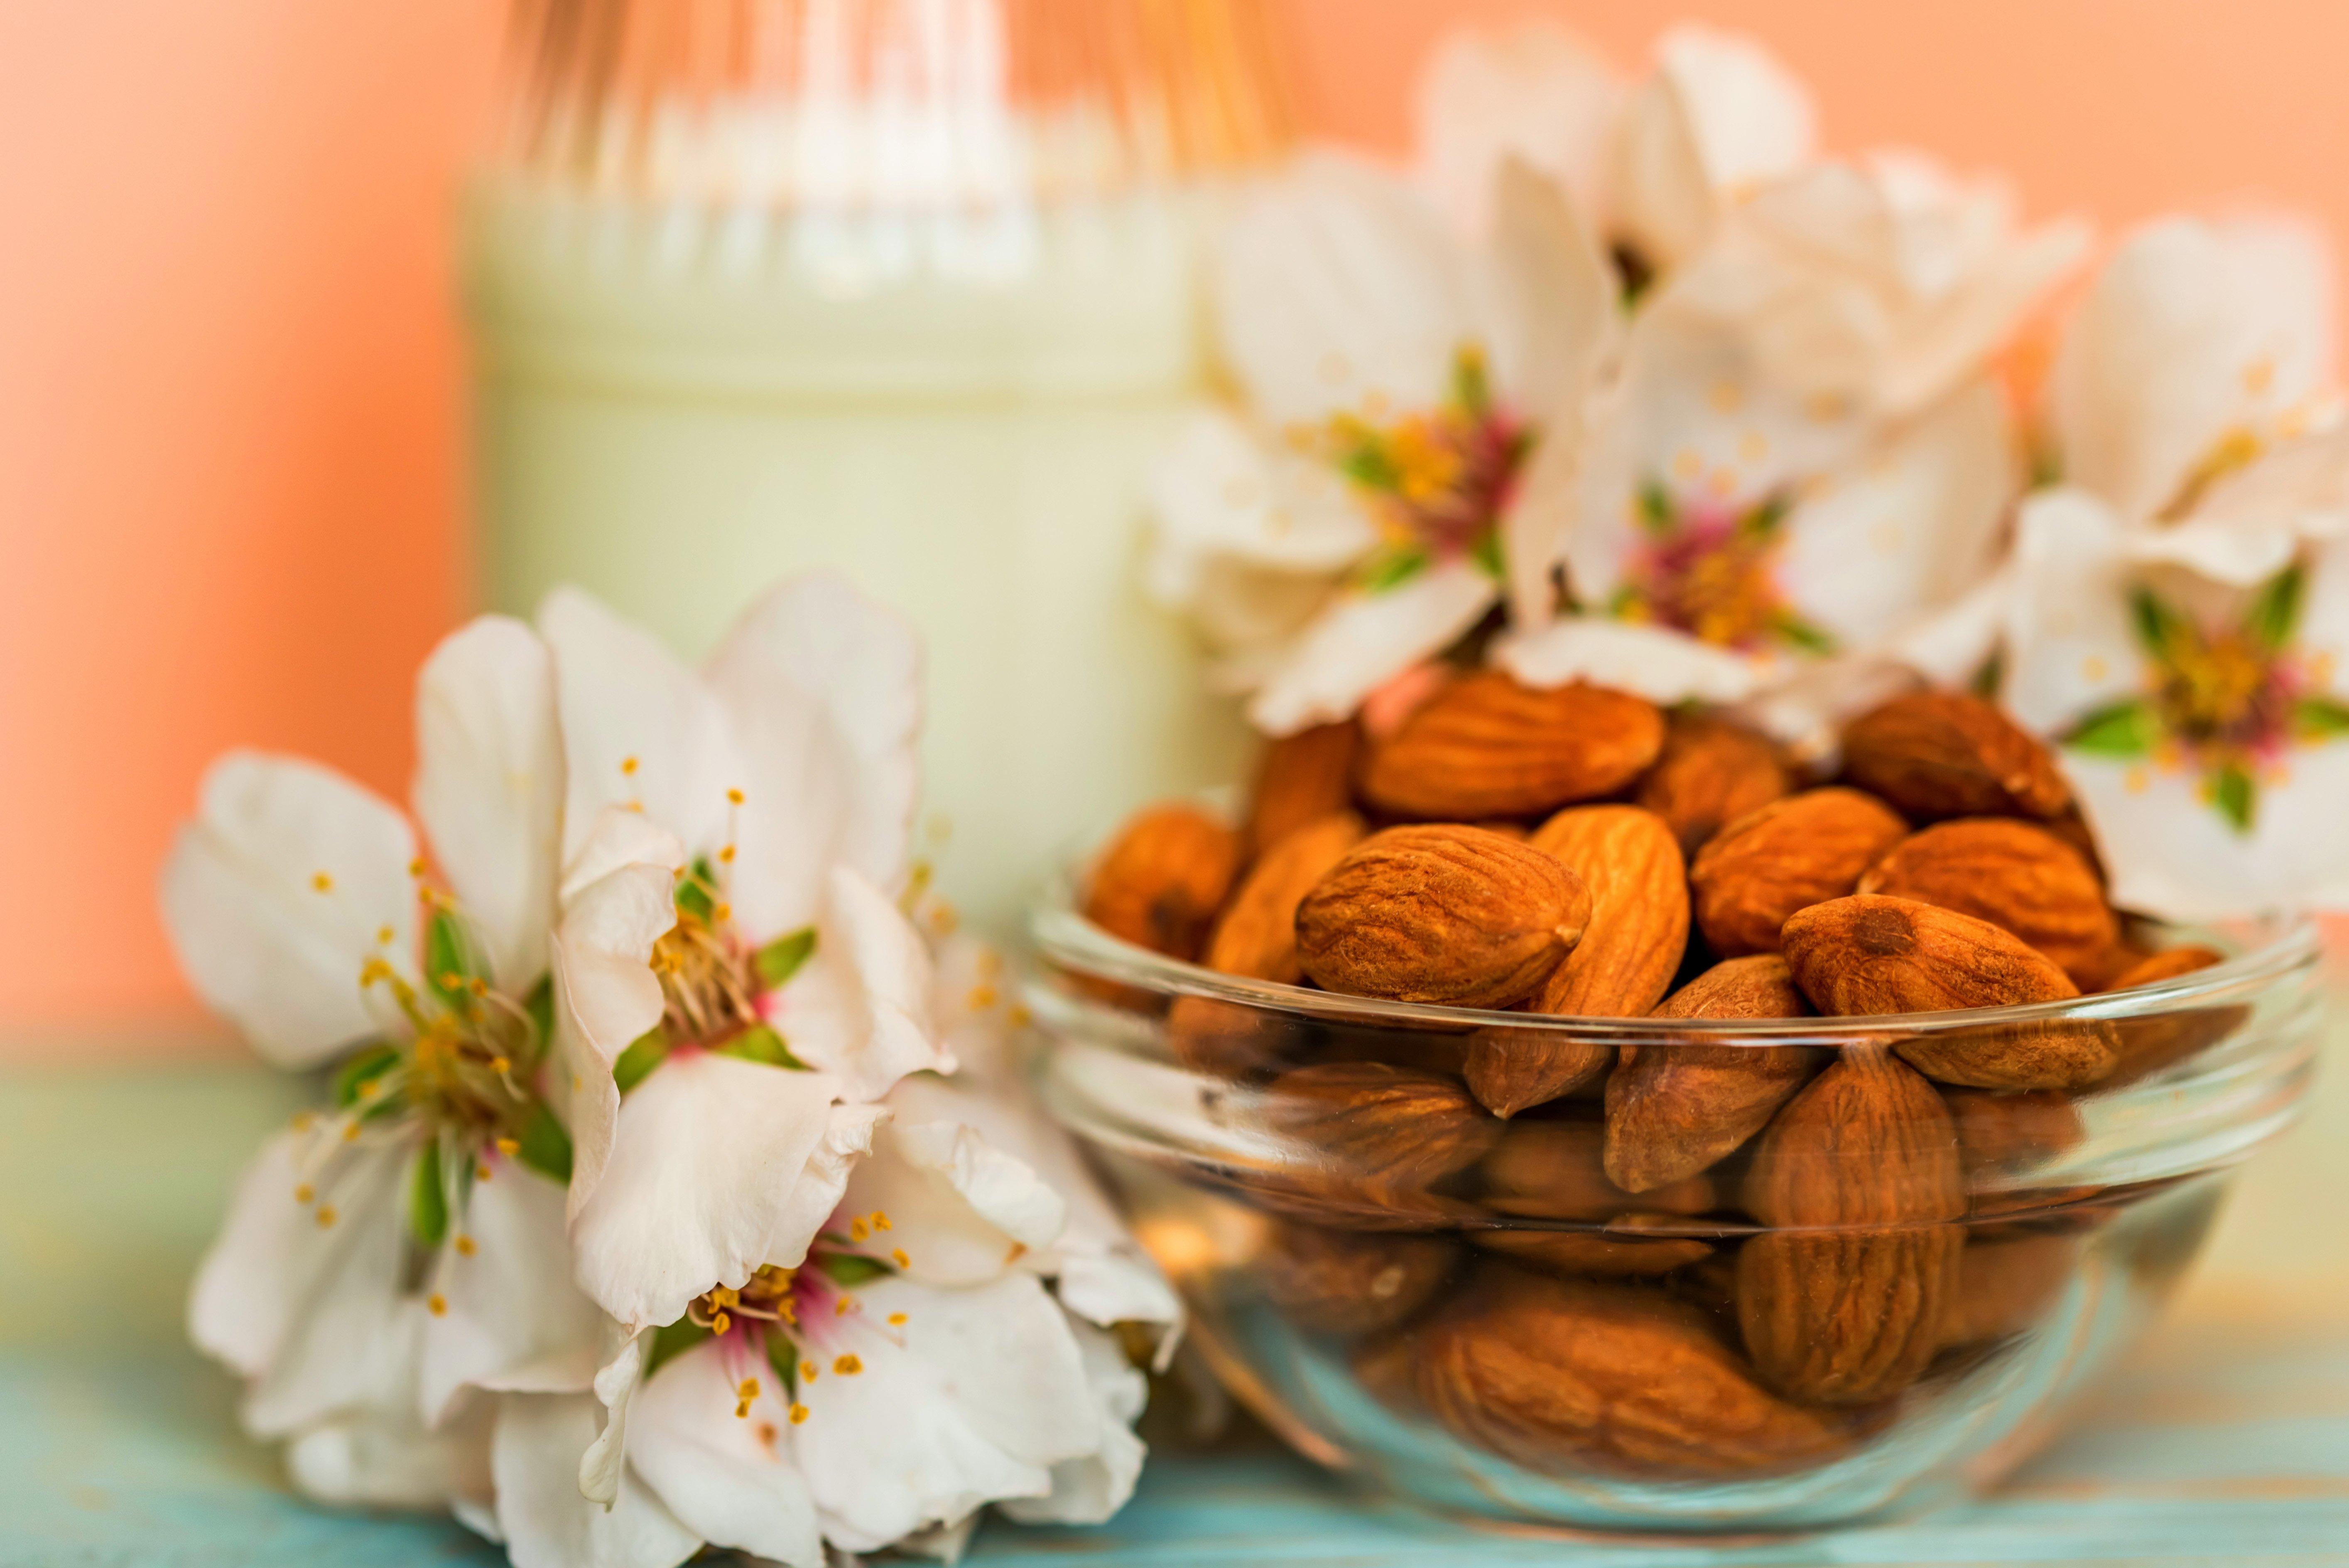 almond-with-jar-of-almond-milk-and-white-flowers-U3ELYWF